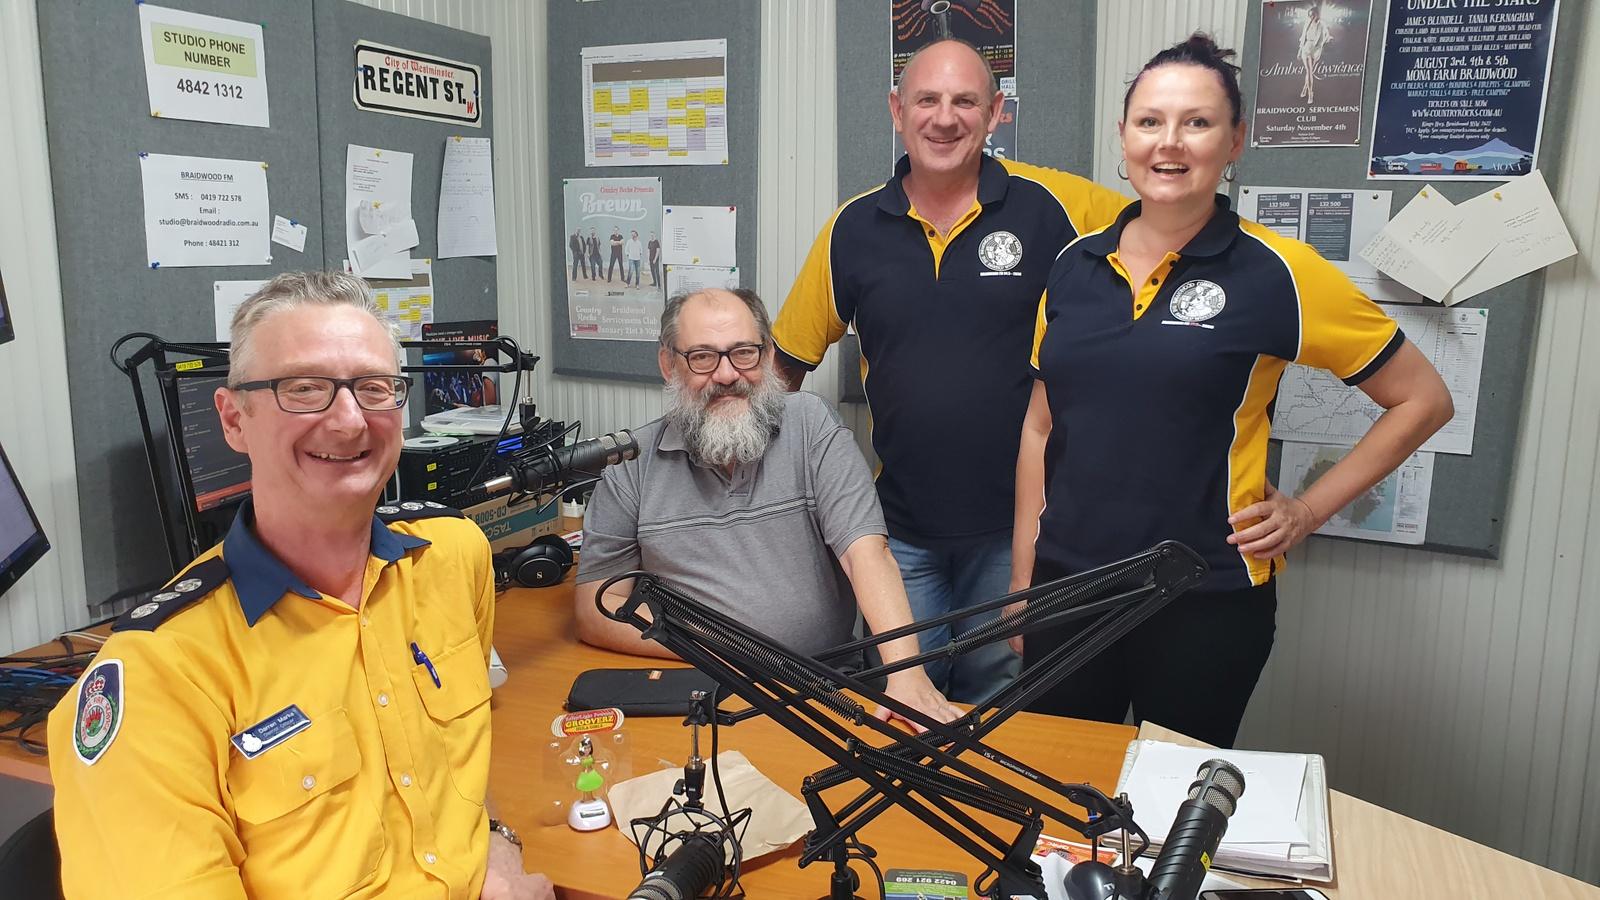 Braidwood FM with Darren Marks (RFS)